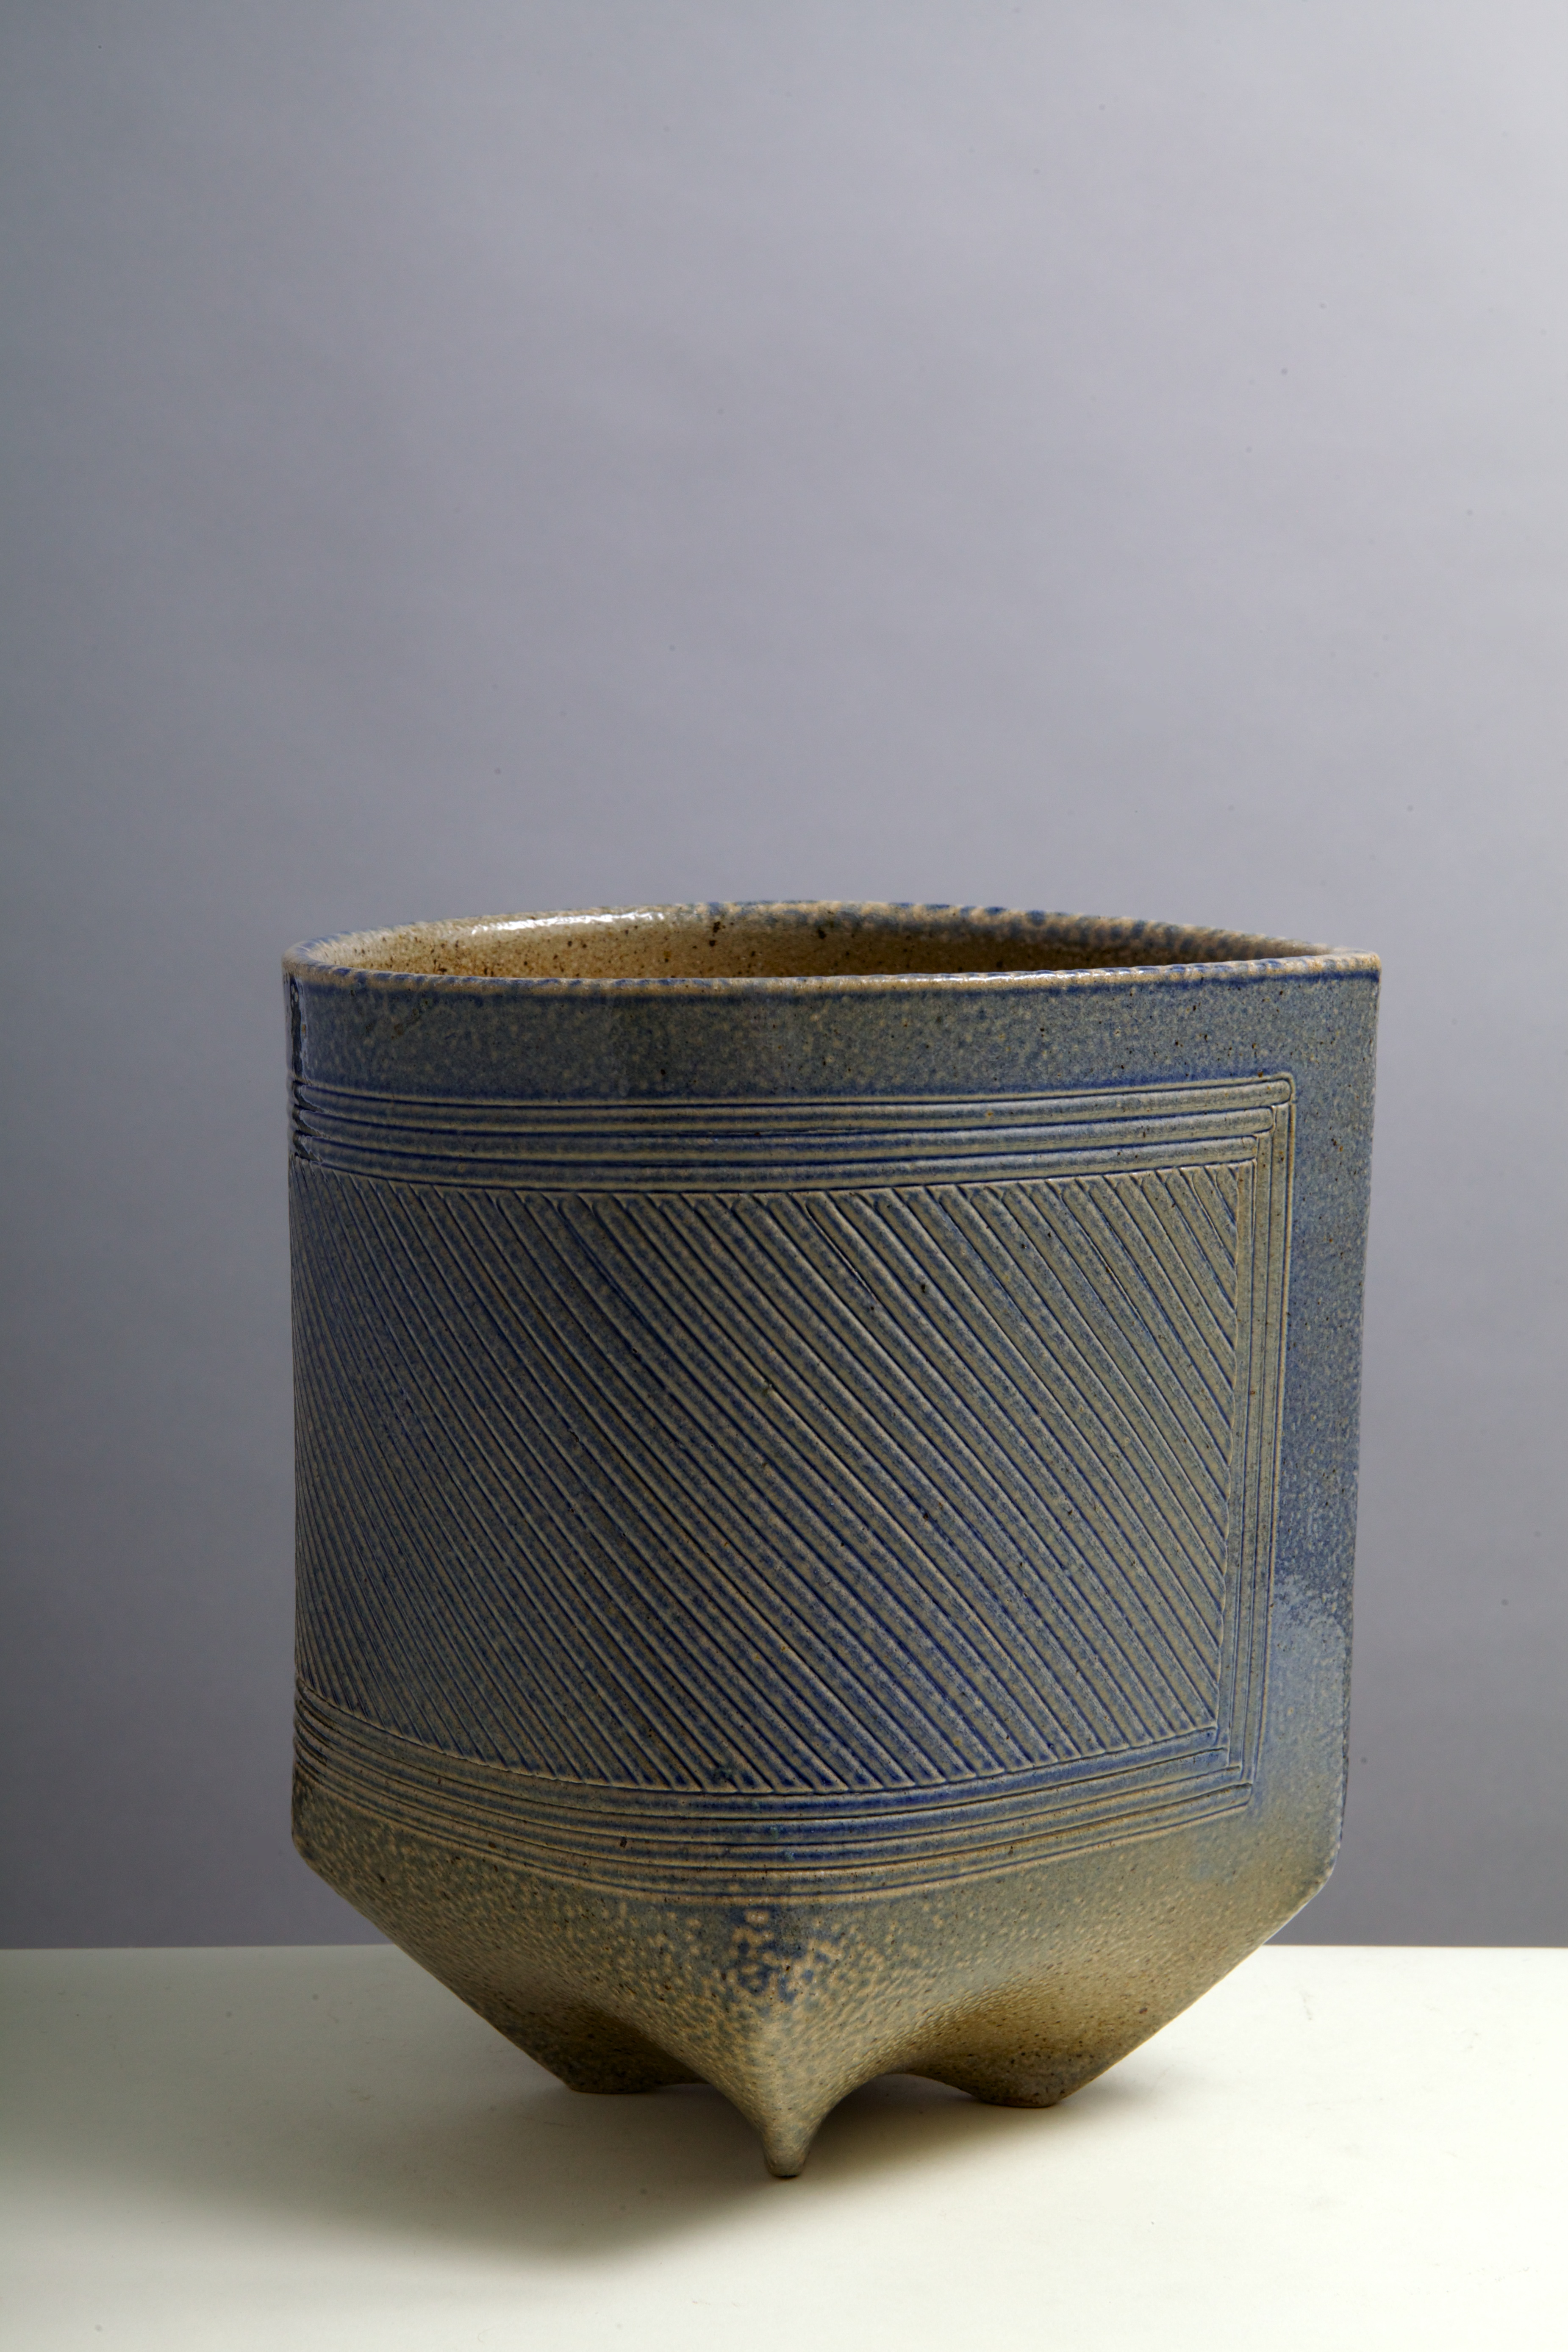 Filefolded slab vase by king ruth yorym 2004 1 1000g filefolded slab vase by king ruth yorym 2004 1 1000 reviewsmspy